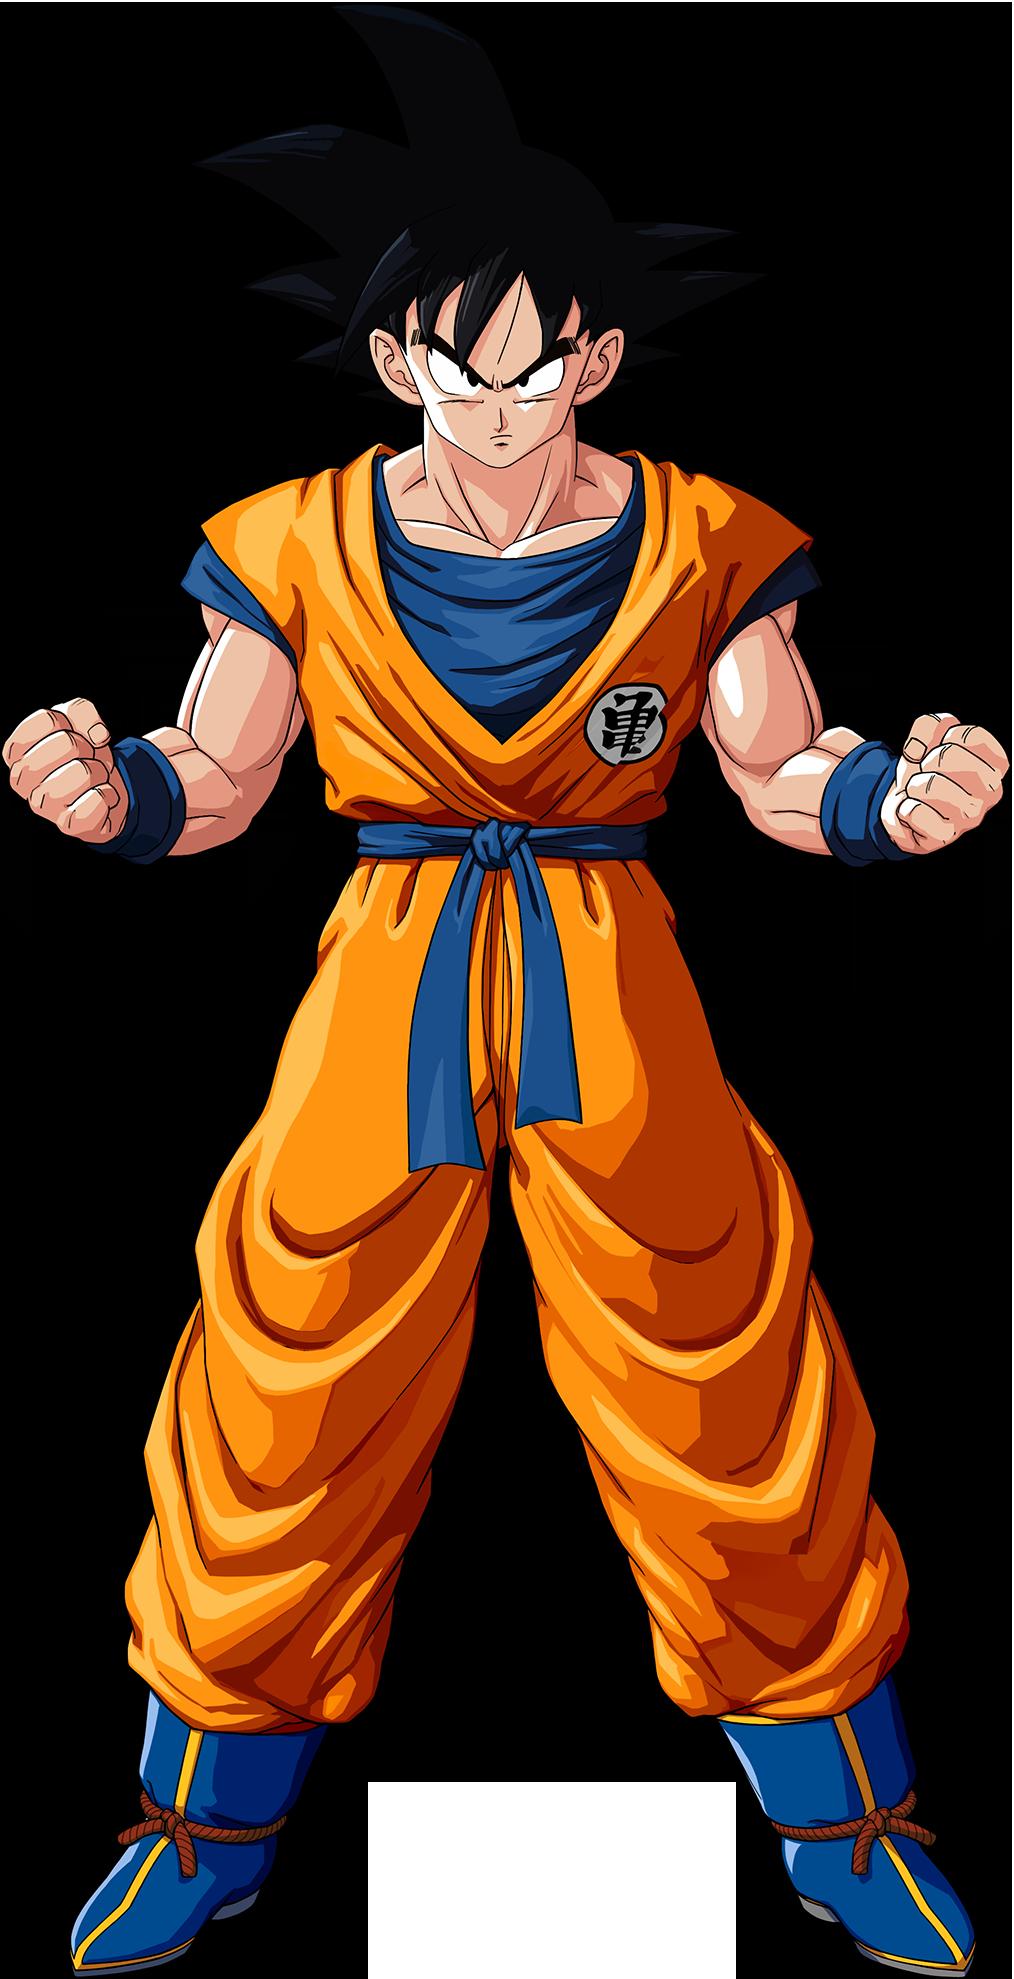 Son Goku render DBZ Kakarot by maxiuchiha22 on DeviantArt